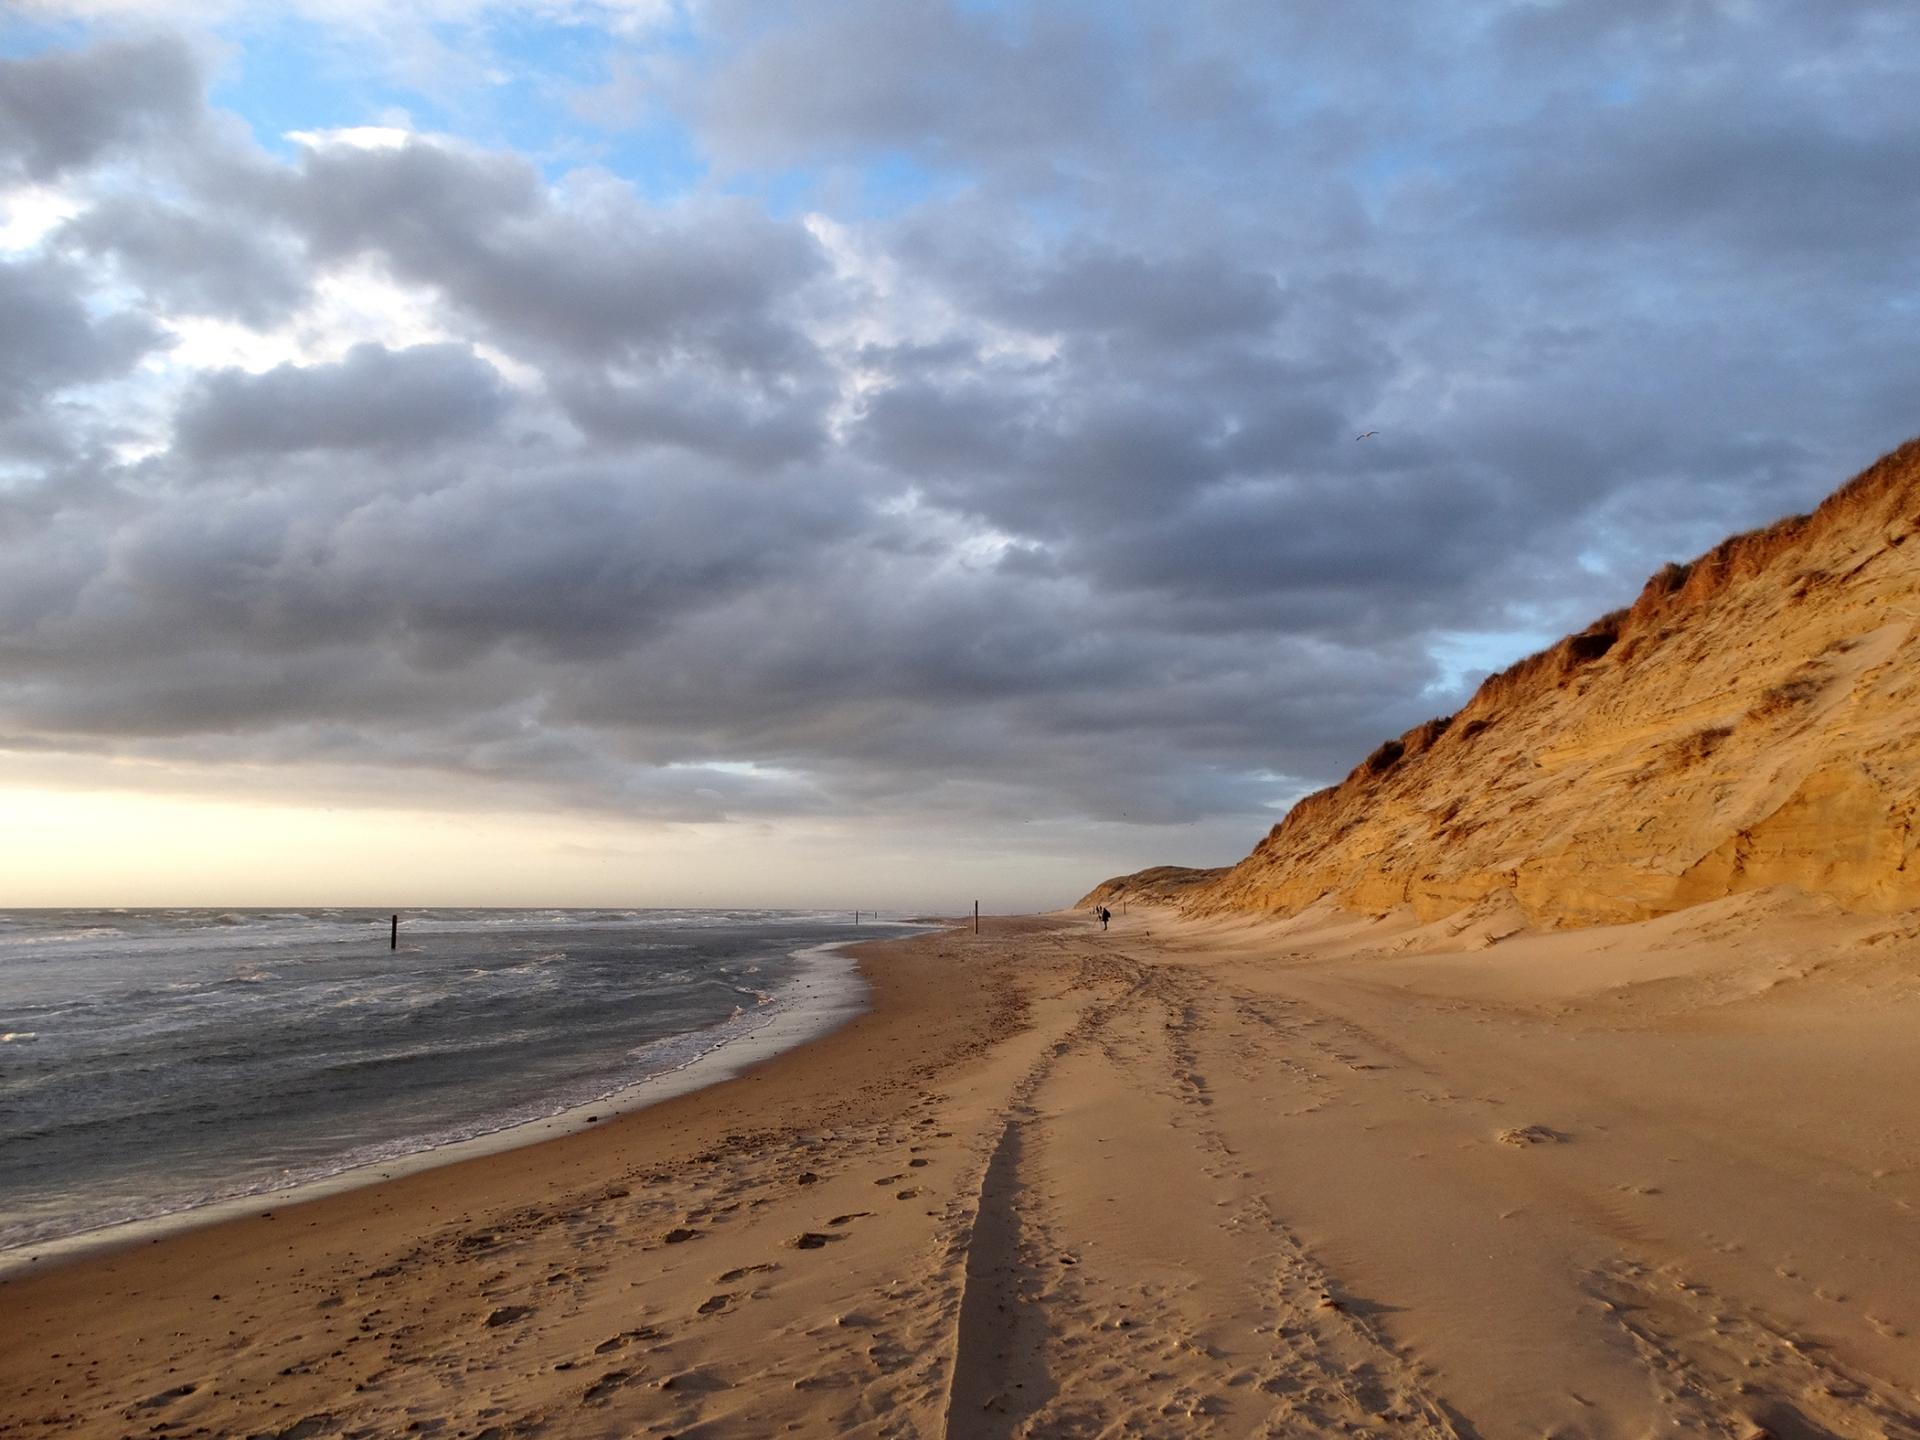 Storm op het strand VVV Texel fotograaf Justin Sinner